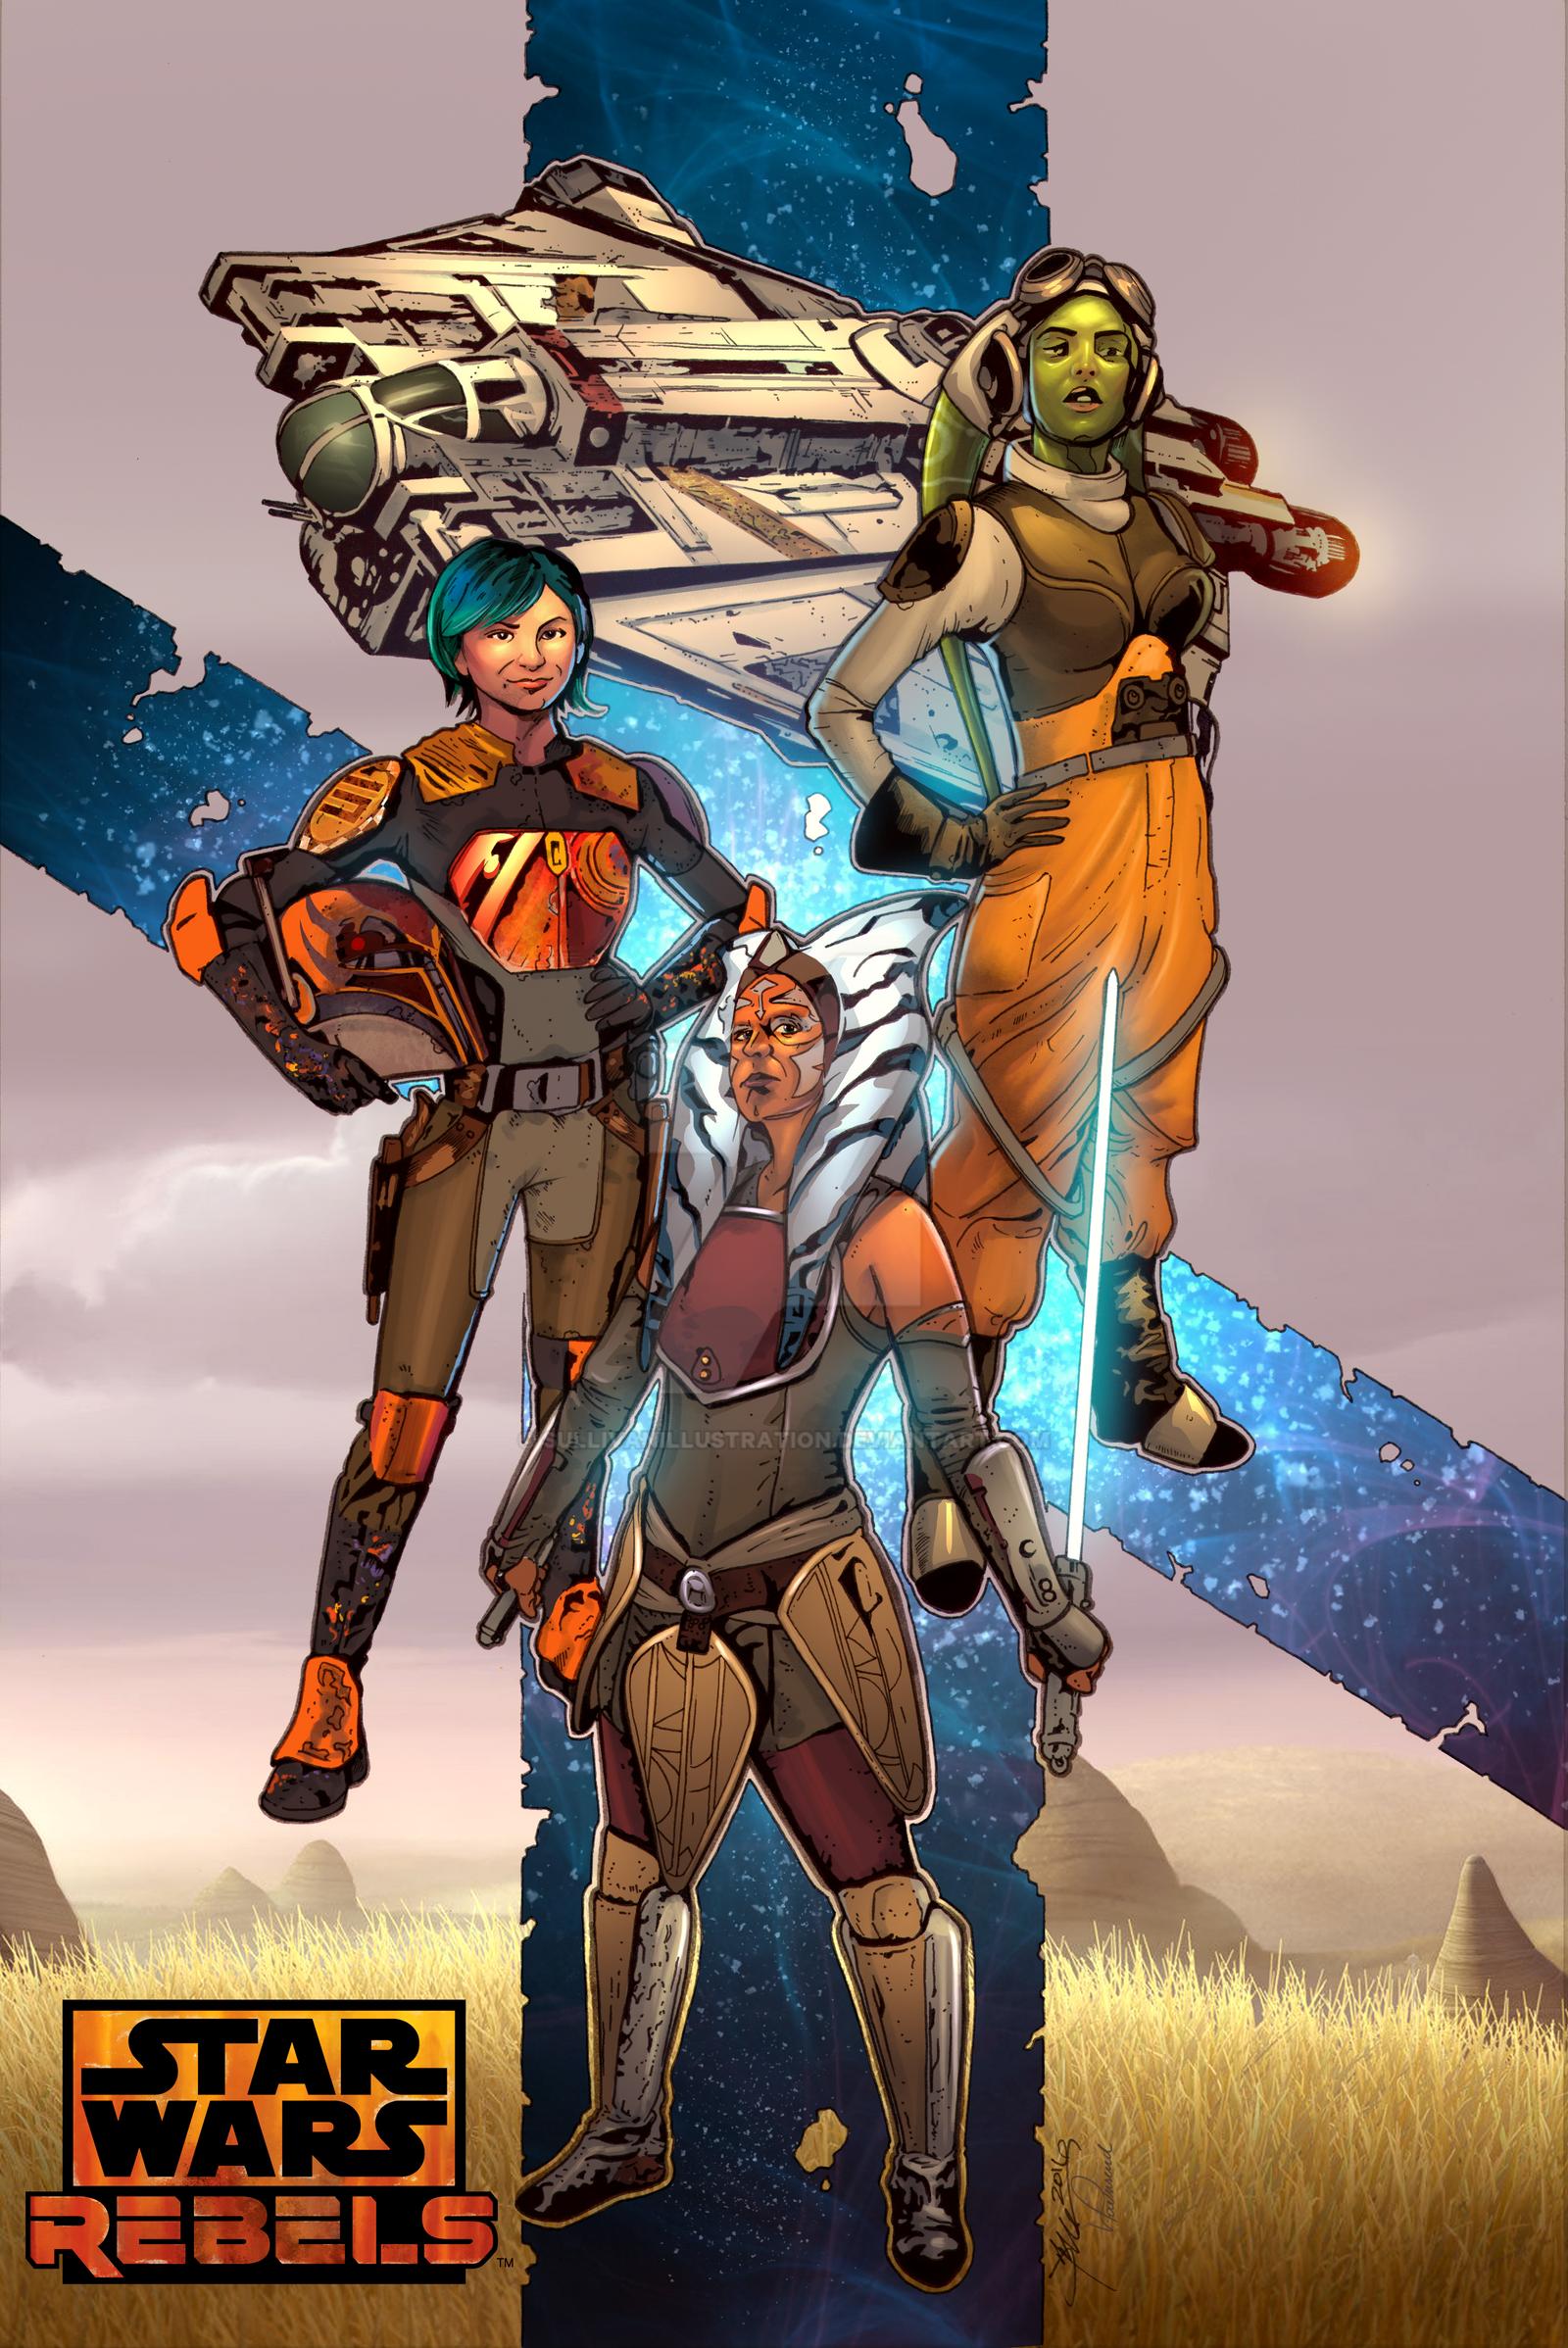 The Women of Star Wars Rebels by sullivanillustration